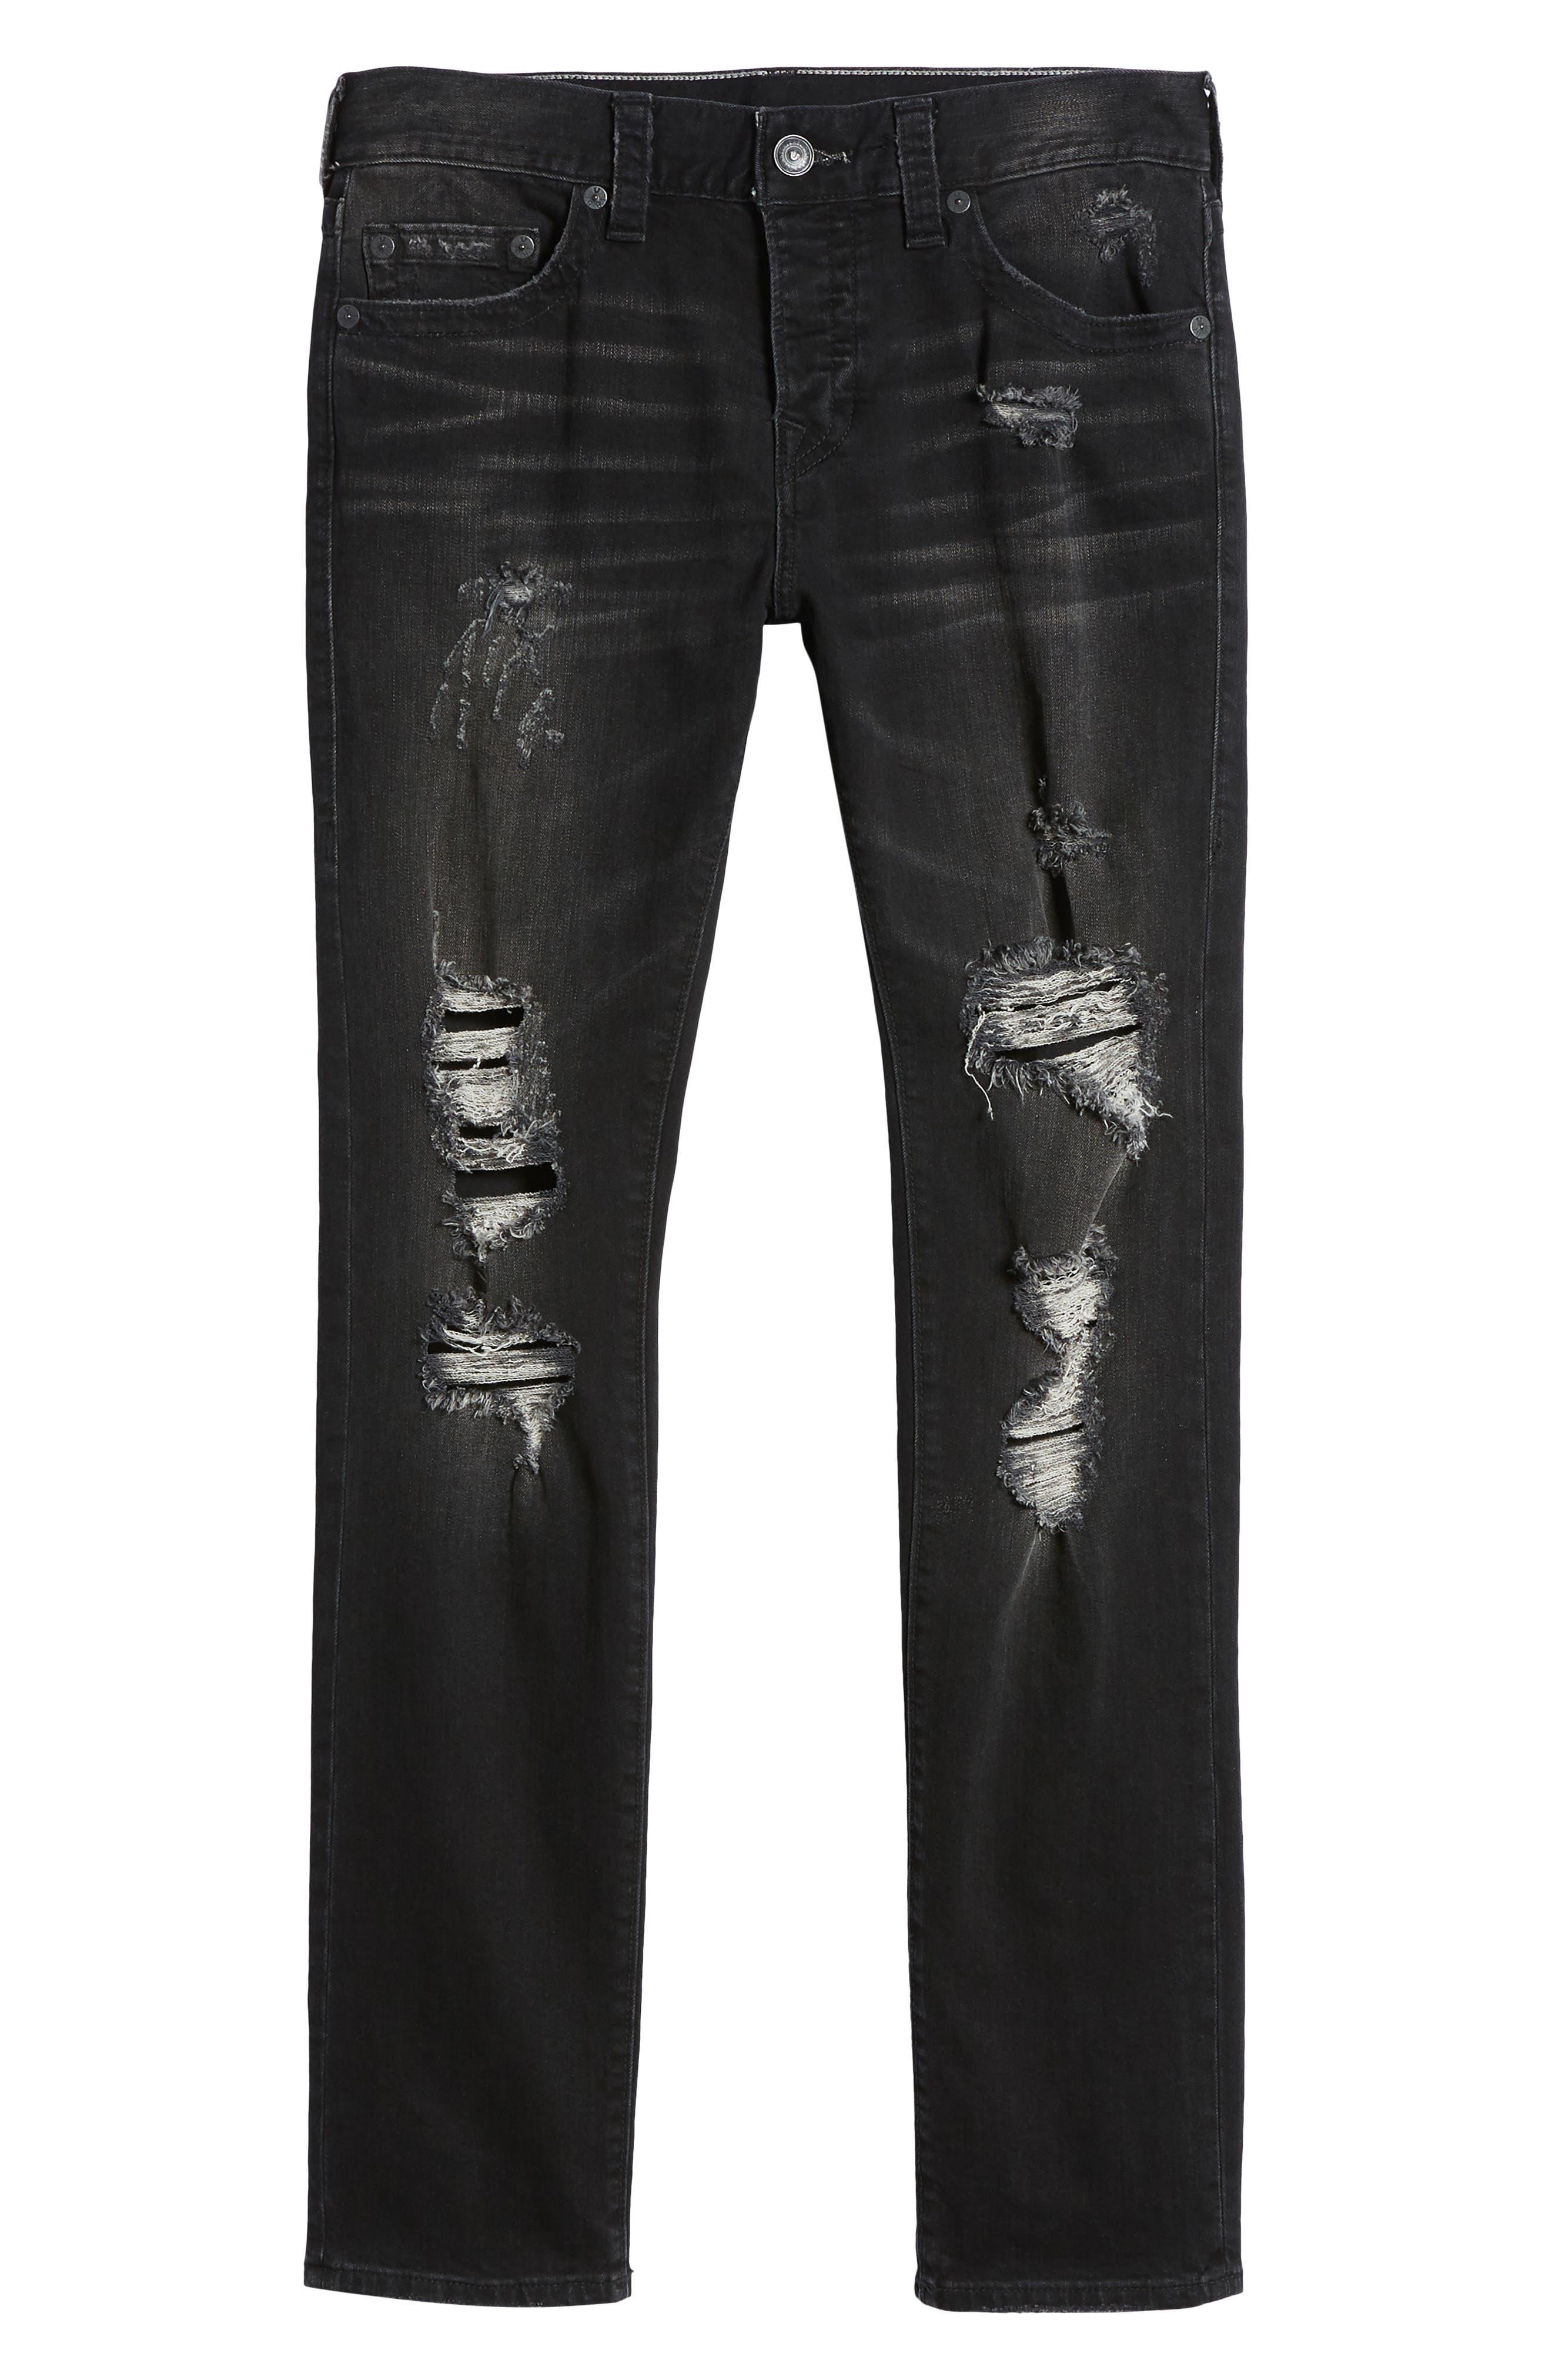 Rocco Skinny Fit Jeans,                             Alternate thumbnail 6, color,                             EQYD DARK STREET